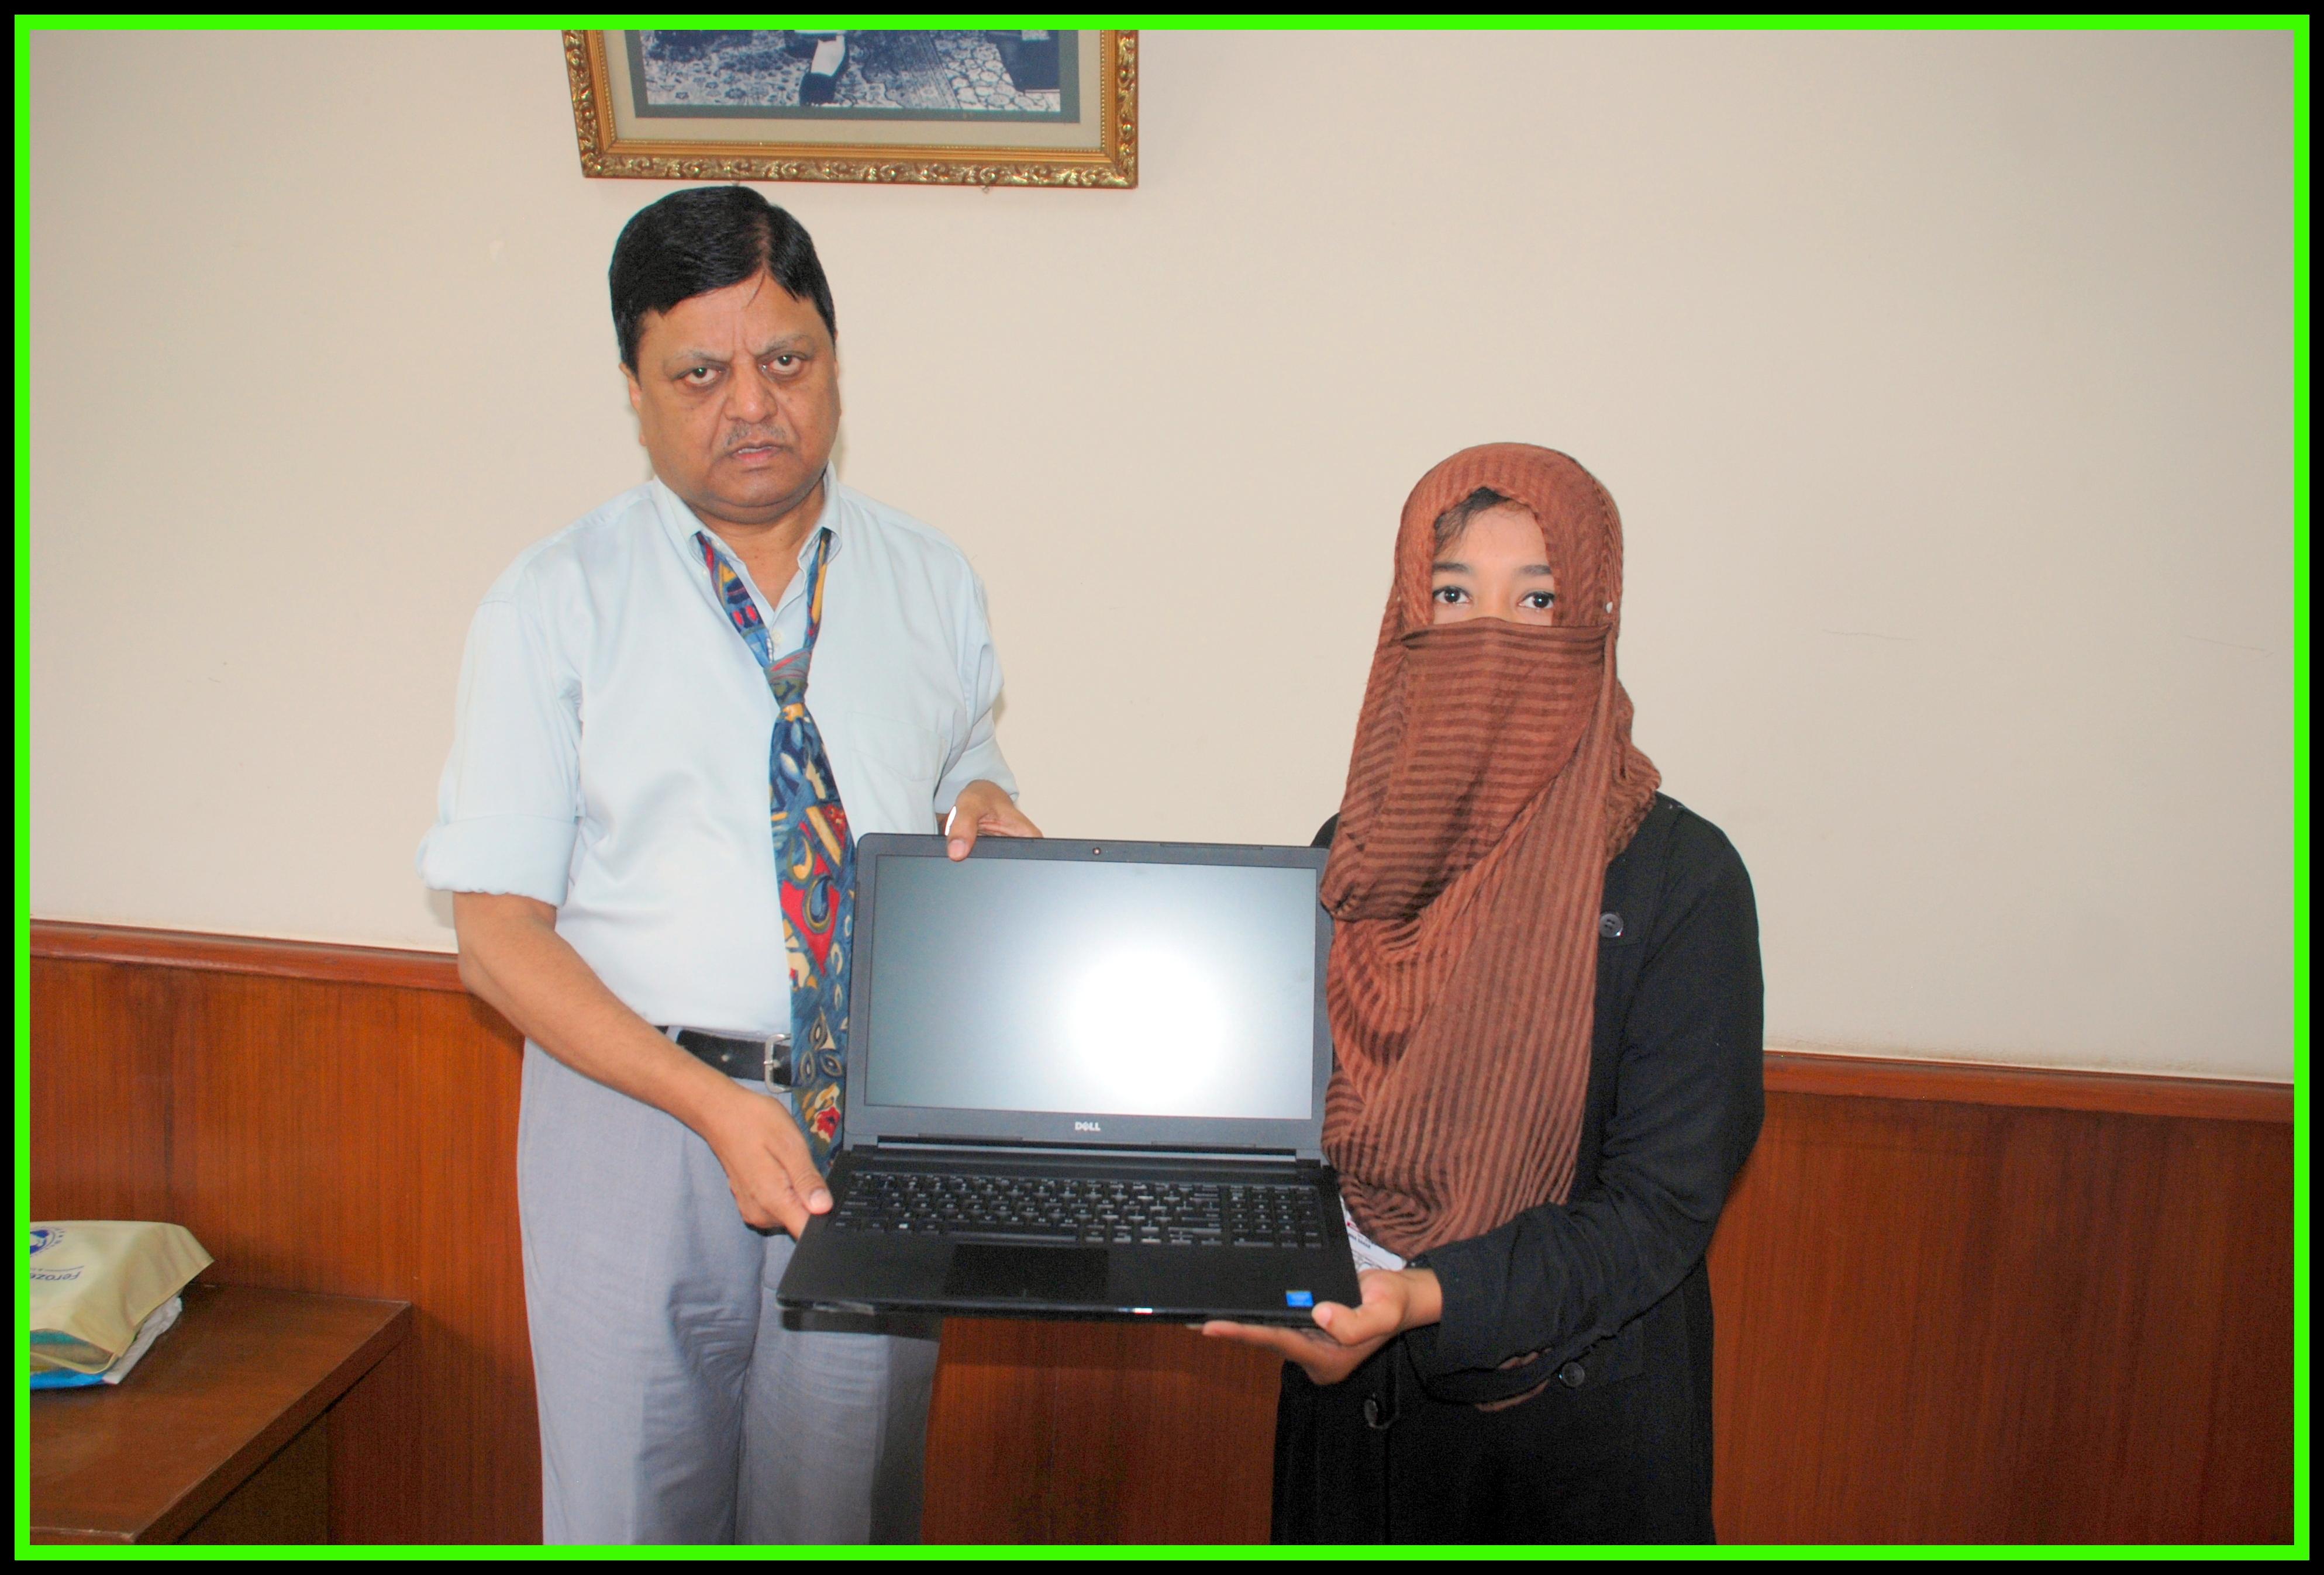 Amna receiving her laptop